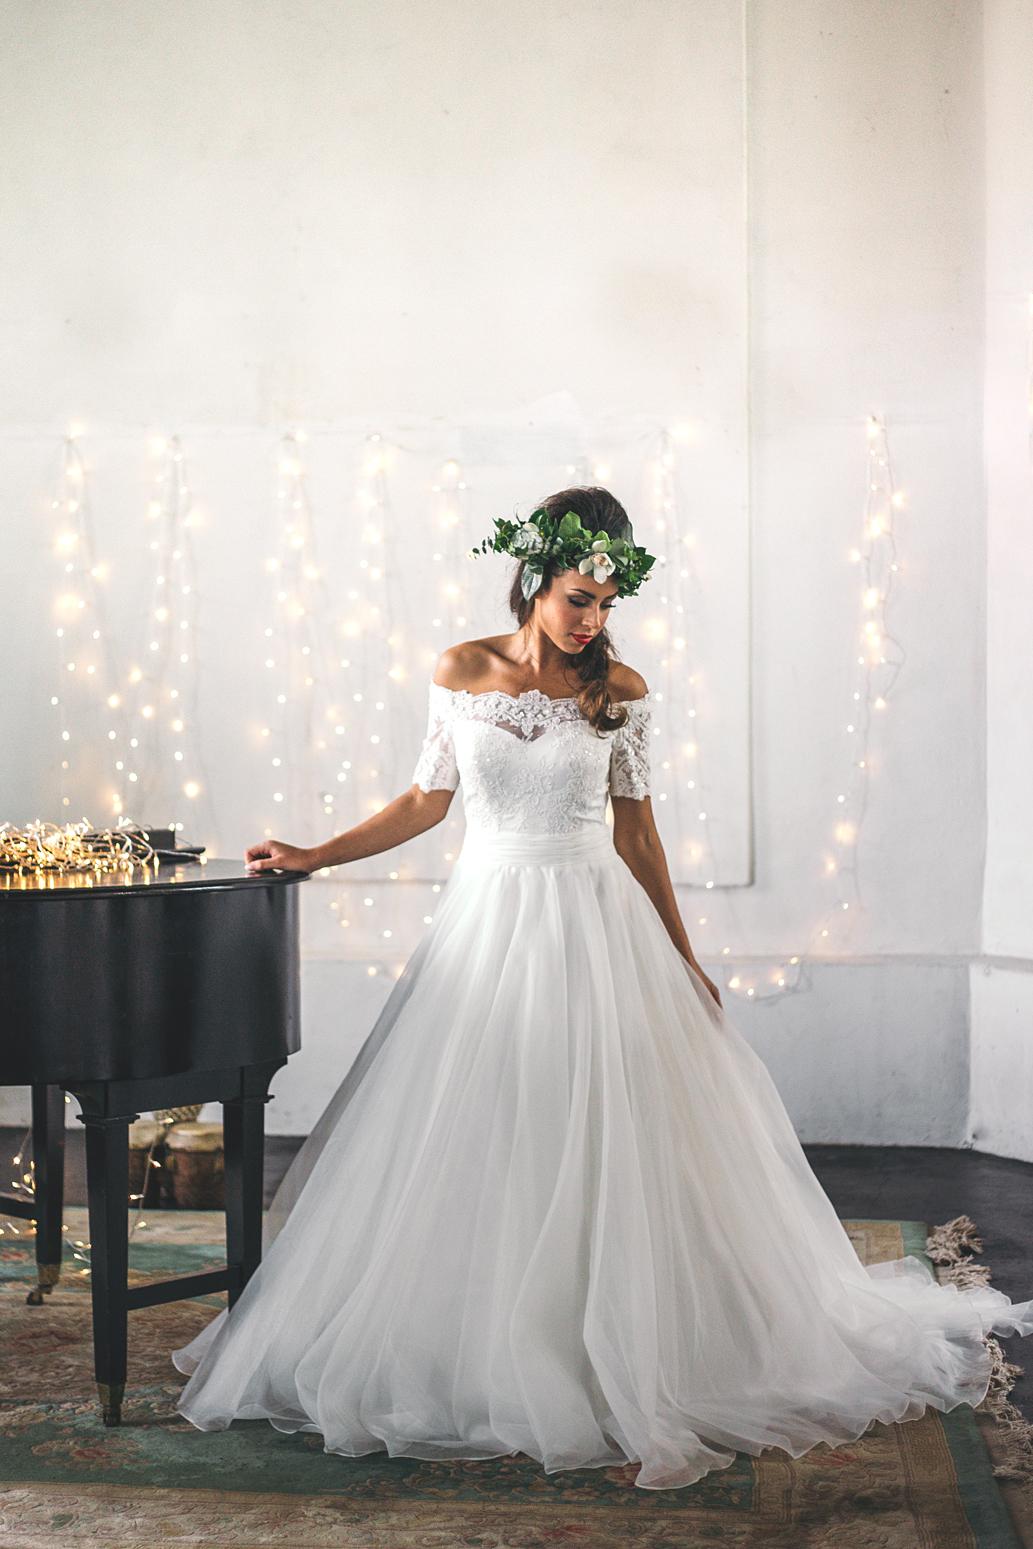 norfolk_wedding_photographer _norwich_anglia_documentary_reportage_storybook (13).jpg